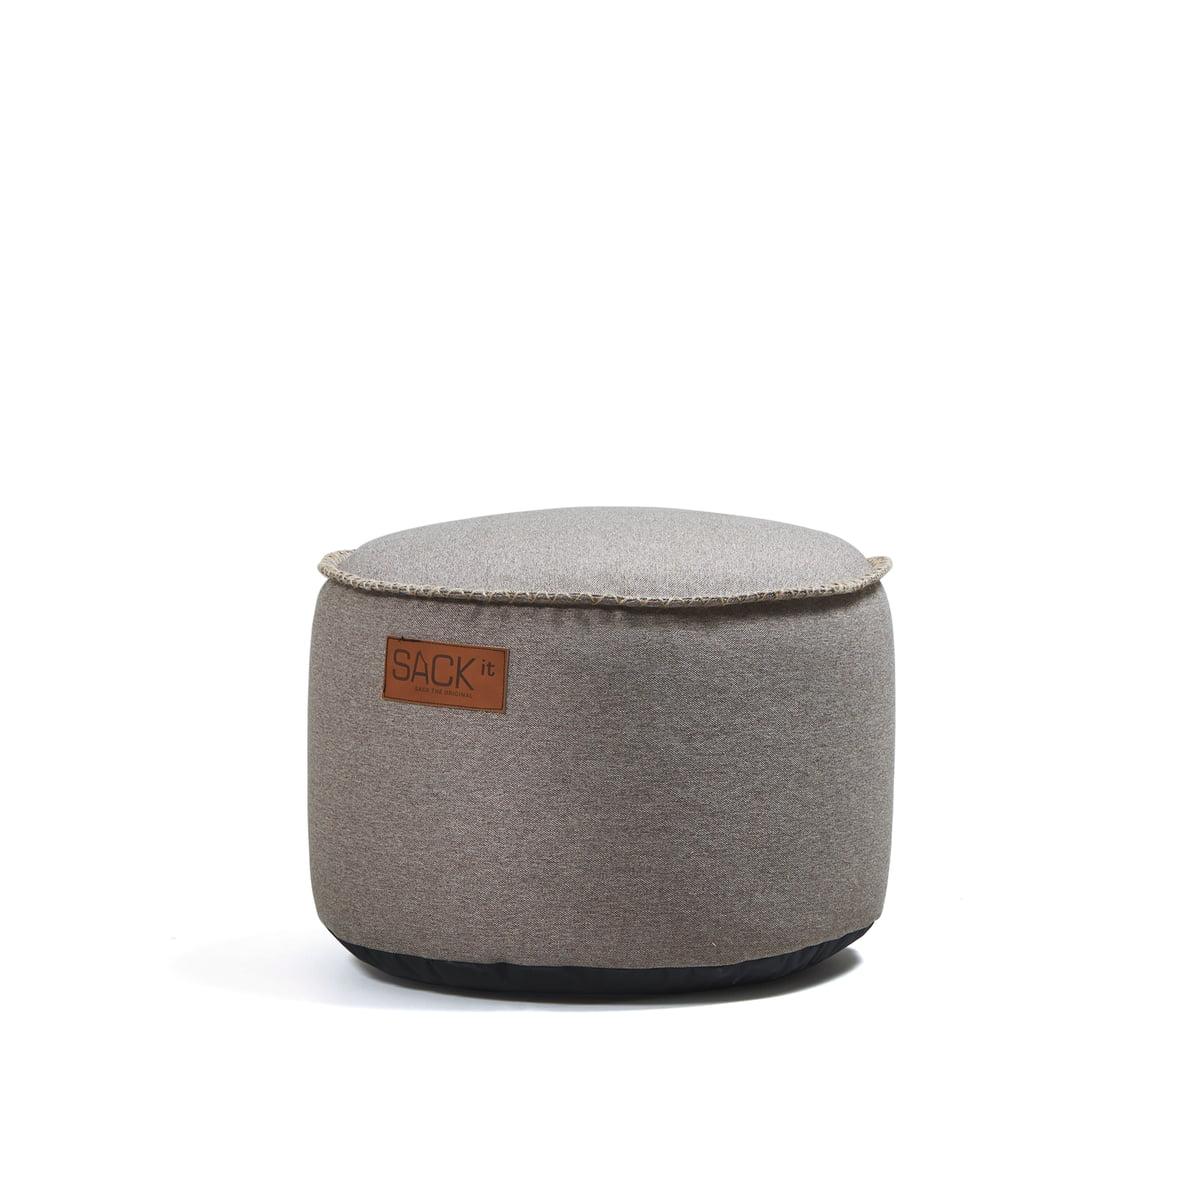 the retro it drum indoor from sack it. Black Bedroom Furniture Sets. Home Design Ideas